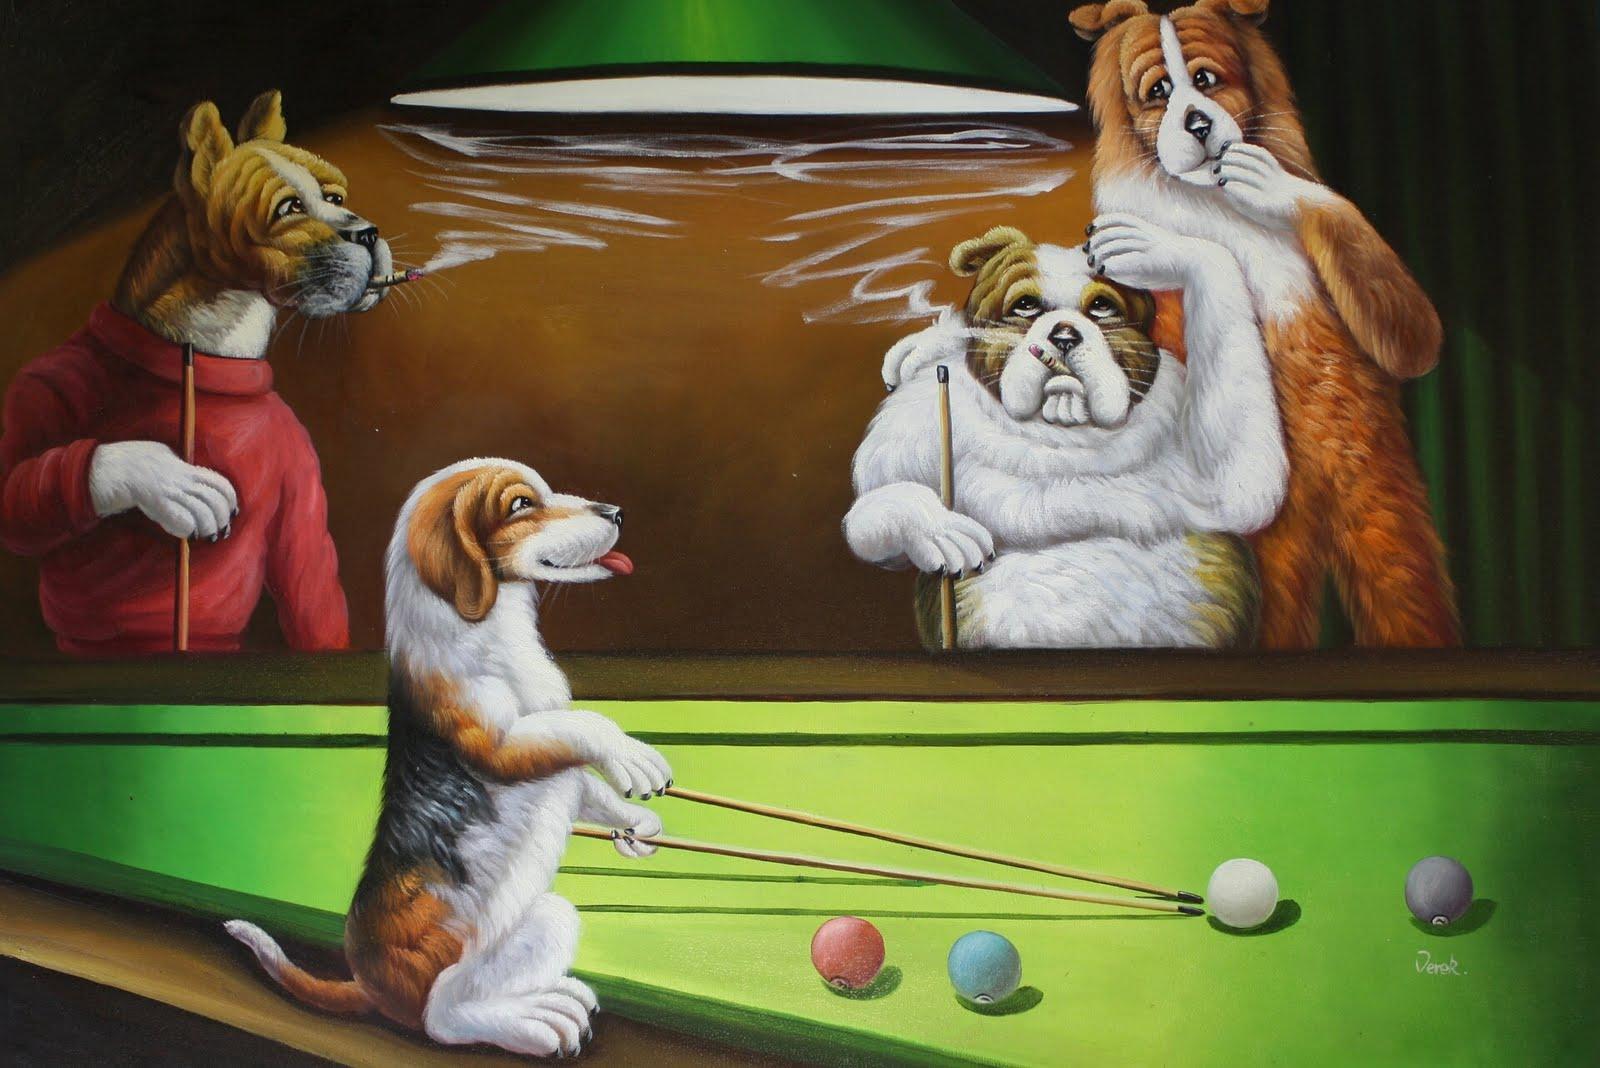 http://3.bp.blogspot.com/-1mqTphXwjY4/TiRlD_yjkSI/AAAAAAAAFjY/QtQ4Uyee5Zo/s1600/jogando+sinuca+Dogs+Playing+Pool.jpg